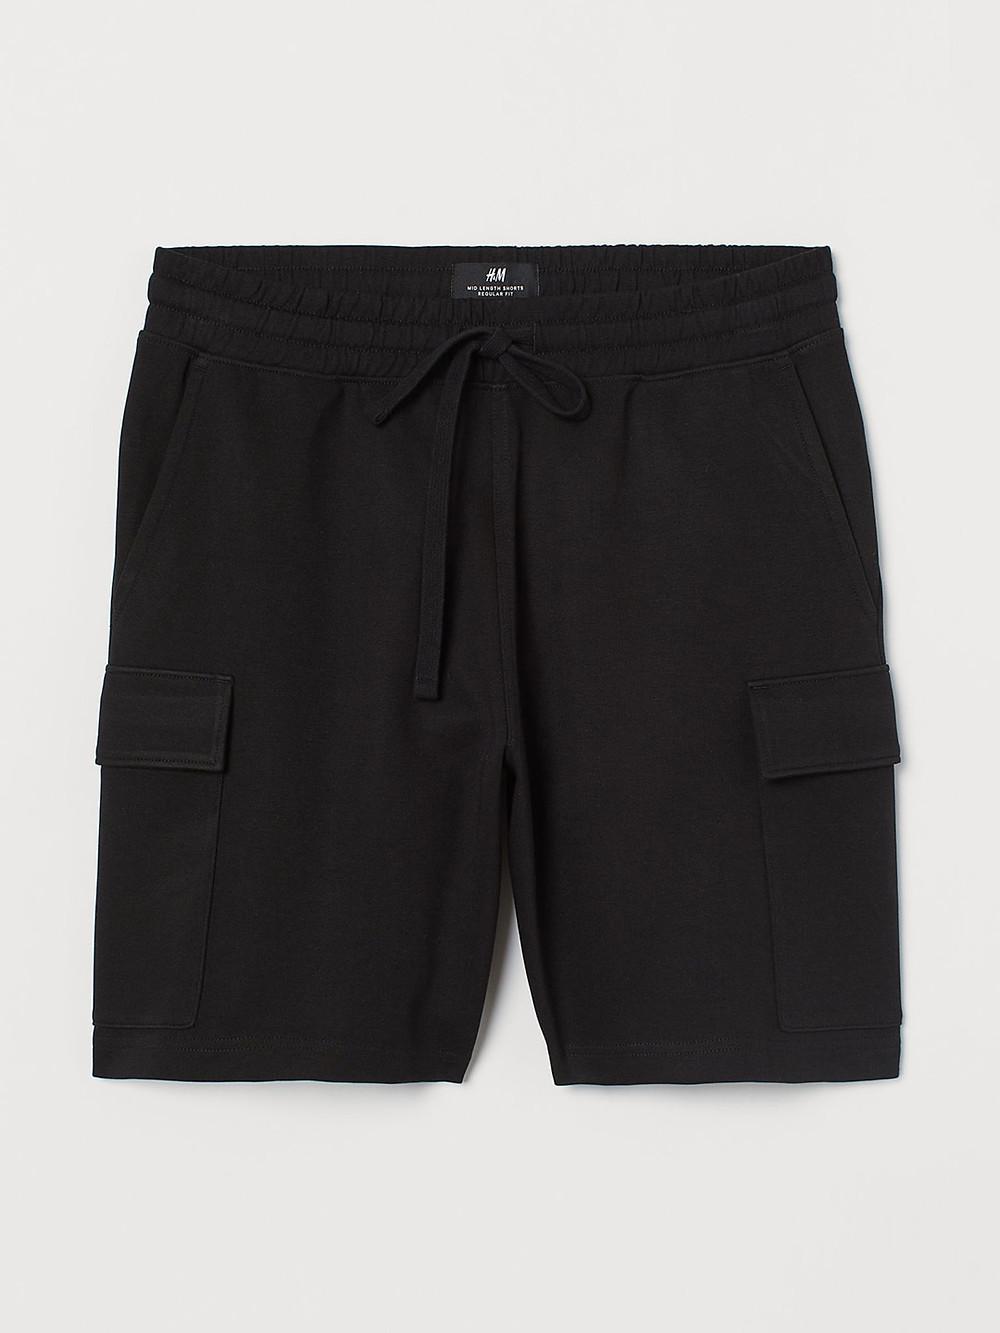 Black Cargo Shorts – H&M